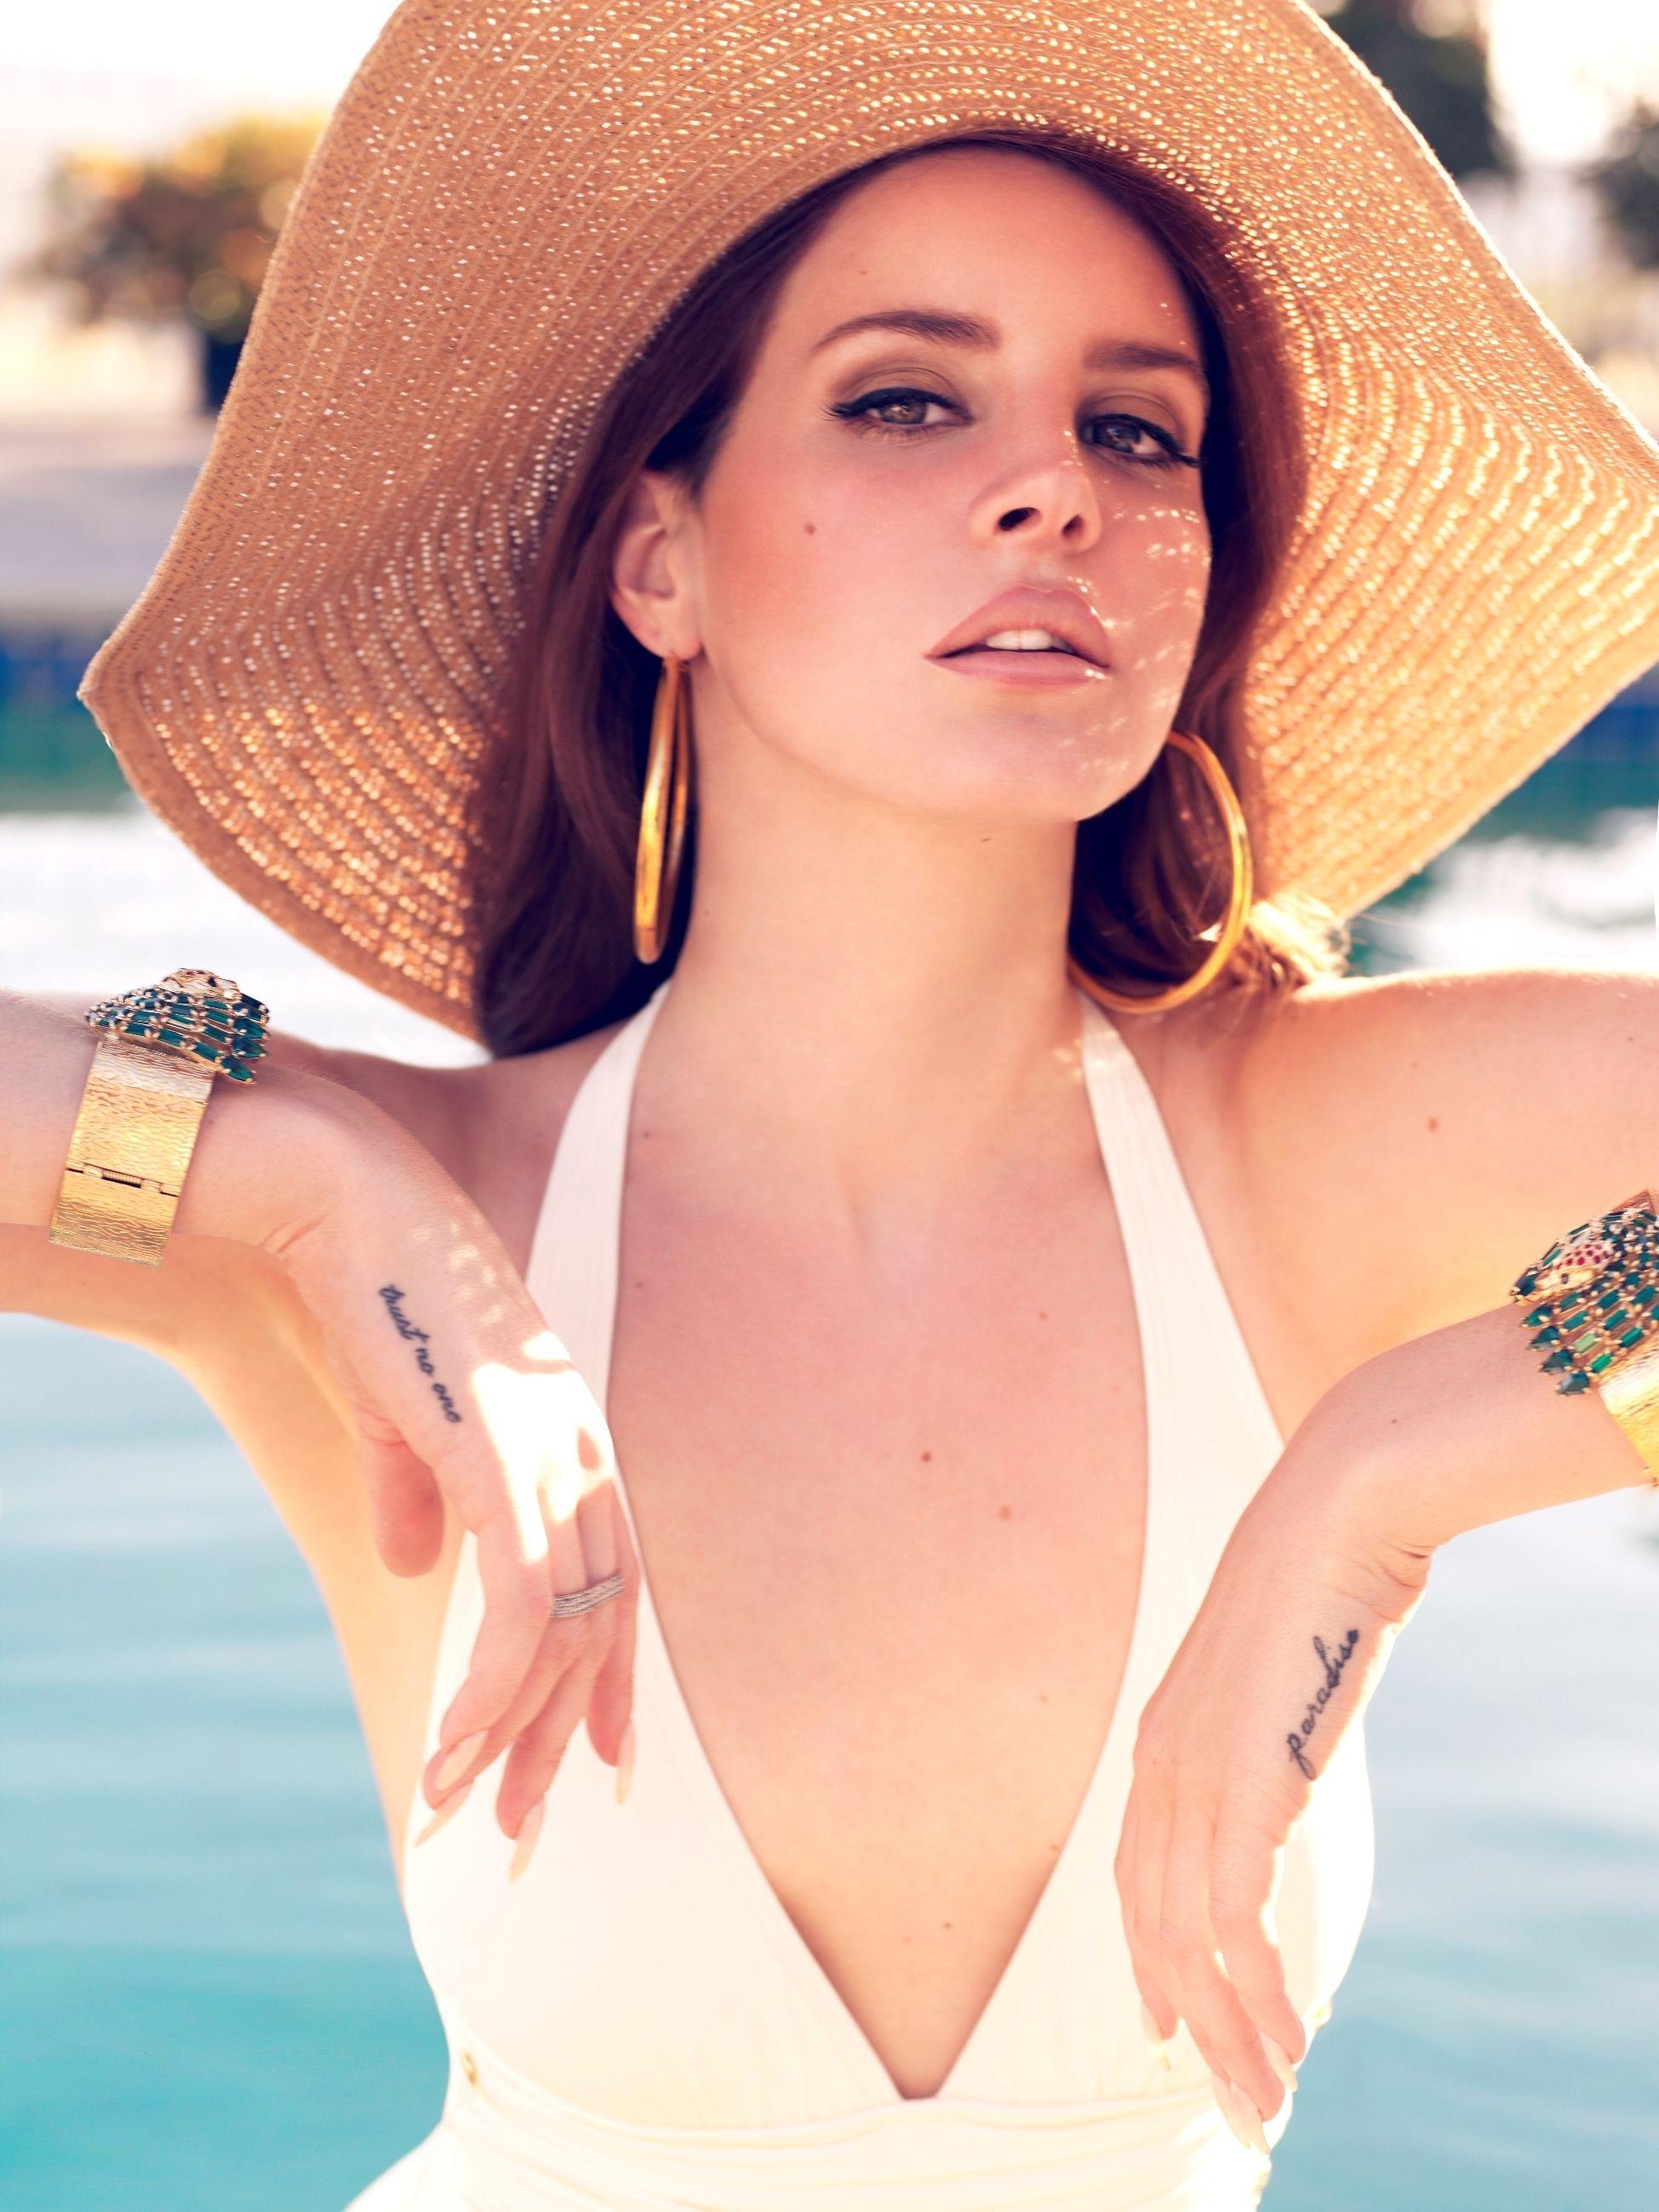 Lana Del Rey 2013 Photoshoot - HD Wallpaper